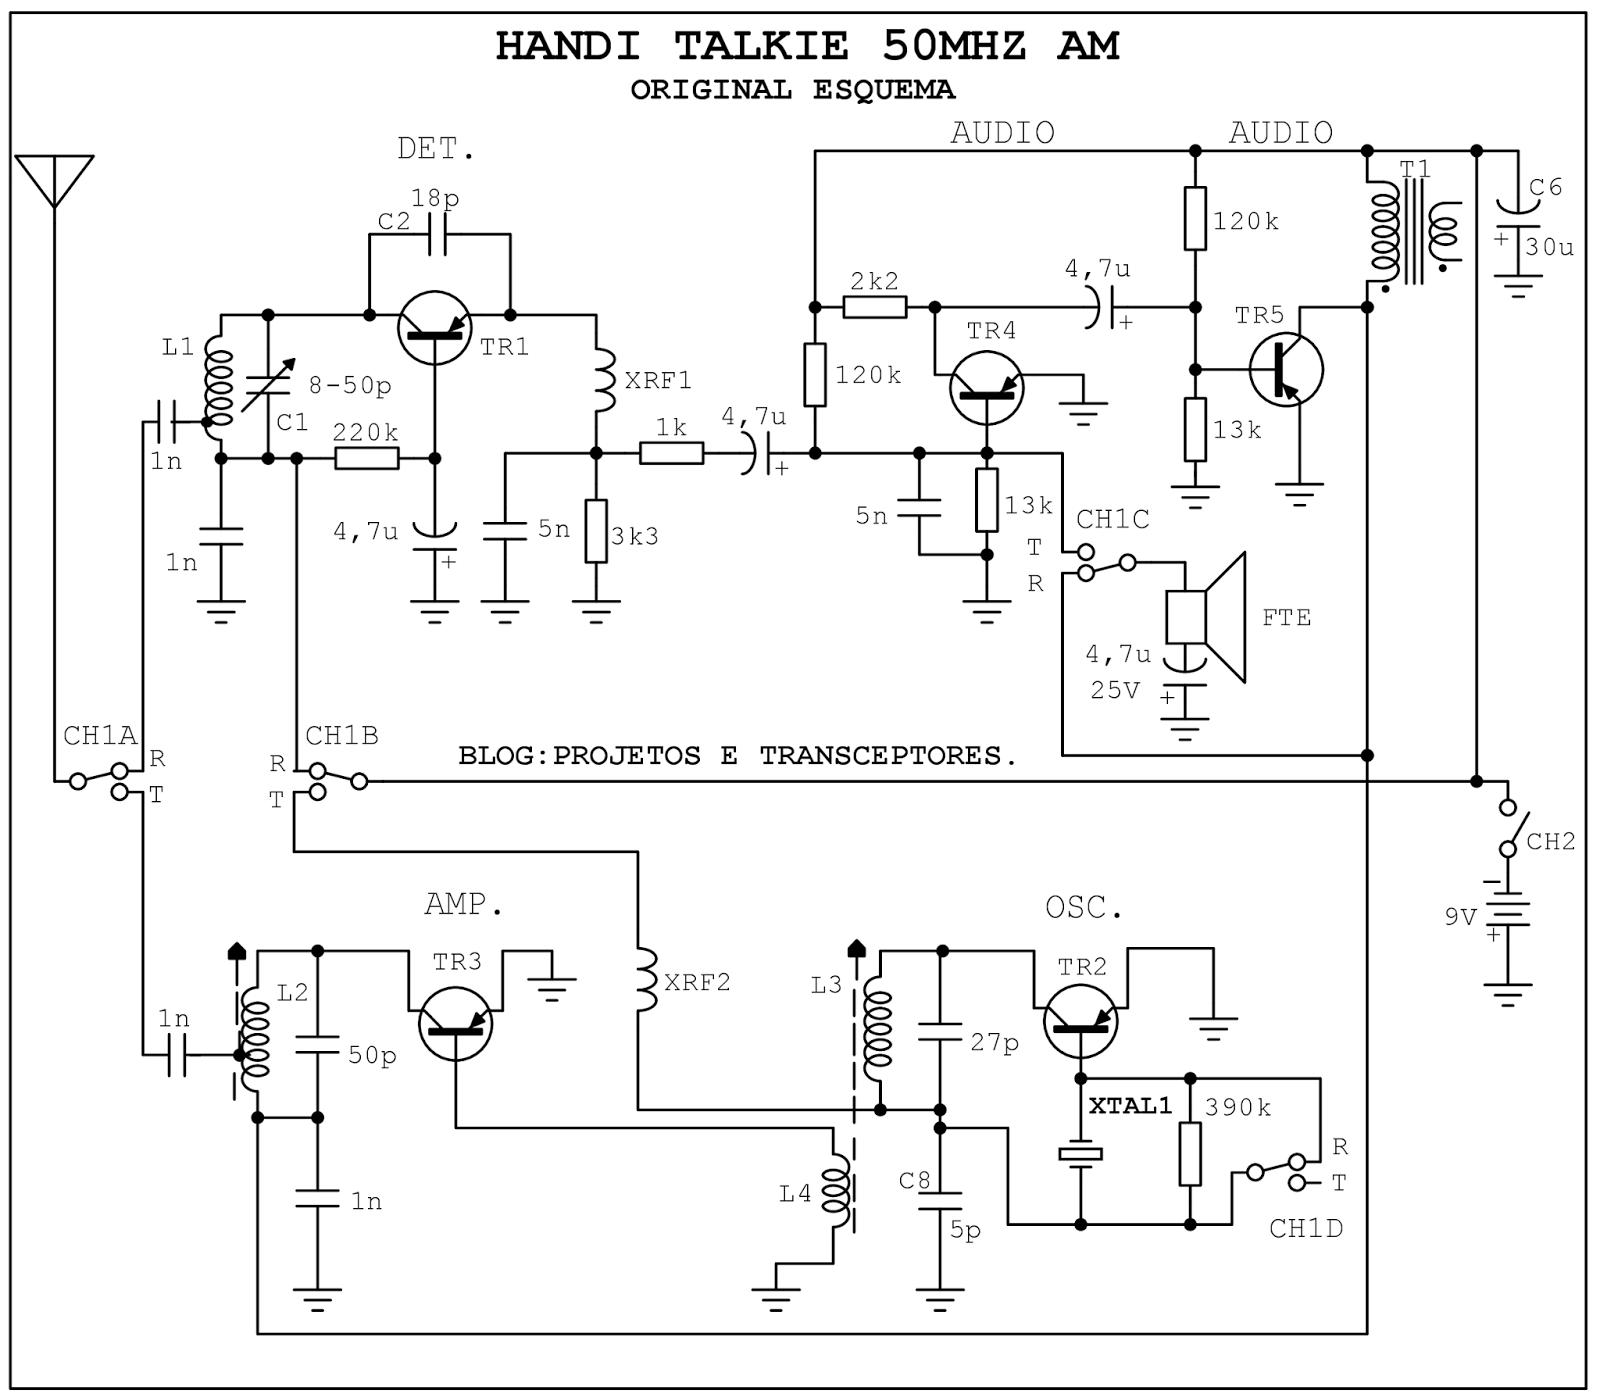 projetos e transceptores   walkie talkie 50mhz am